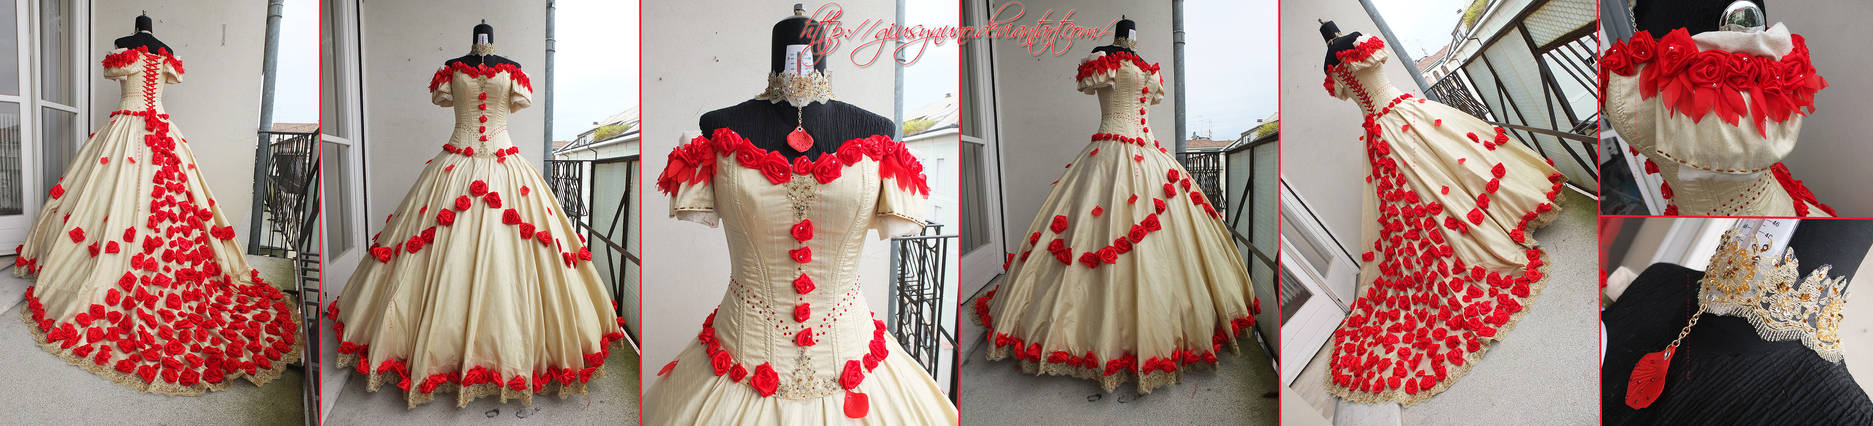 Original Rose Cascade Belle ballgown - BatB